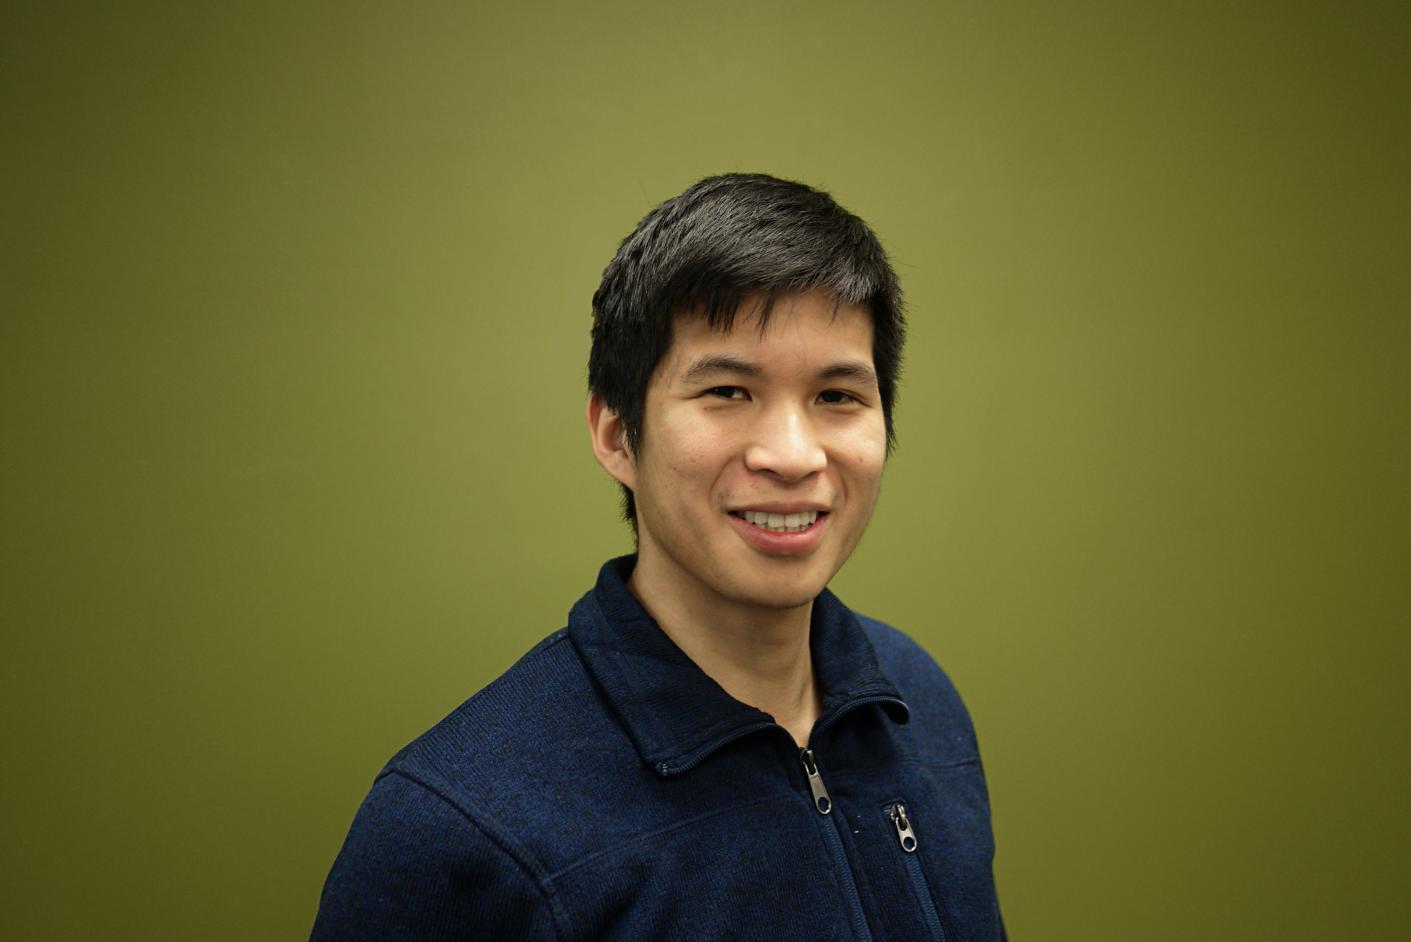 MHCI student Frank Teng